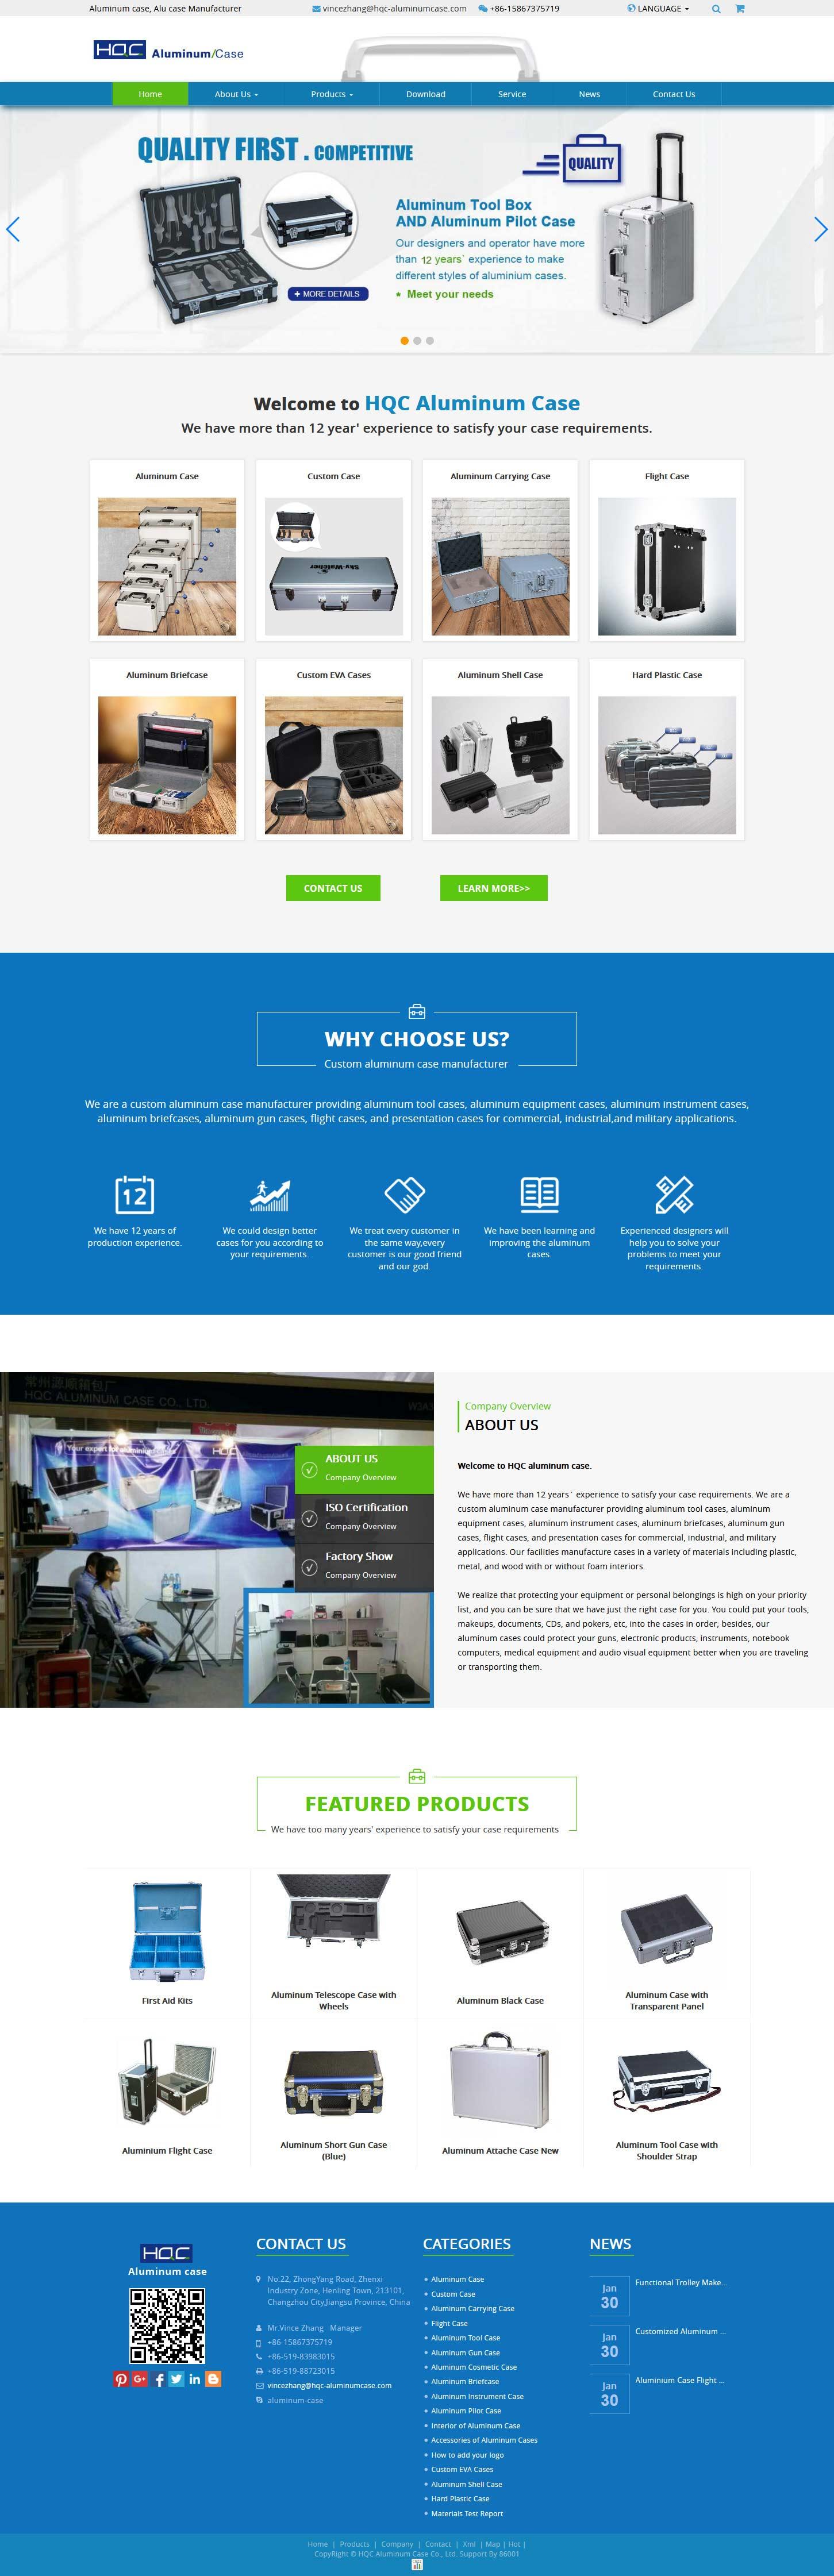 www.hqc-aluminumcase.com